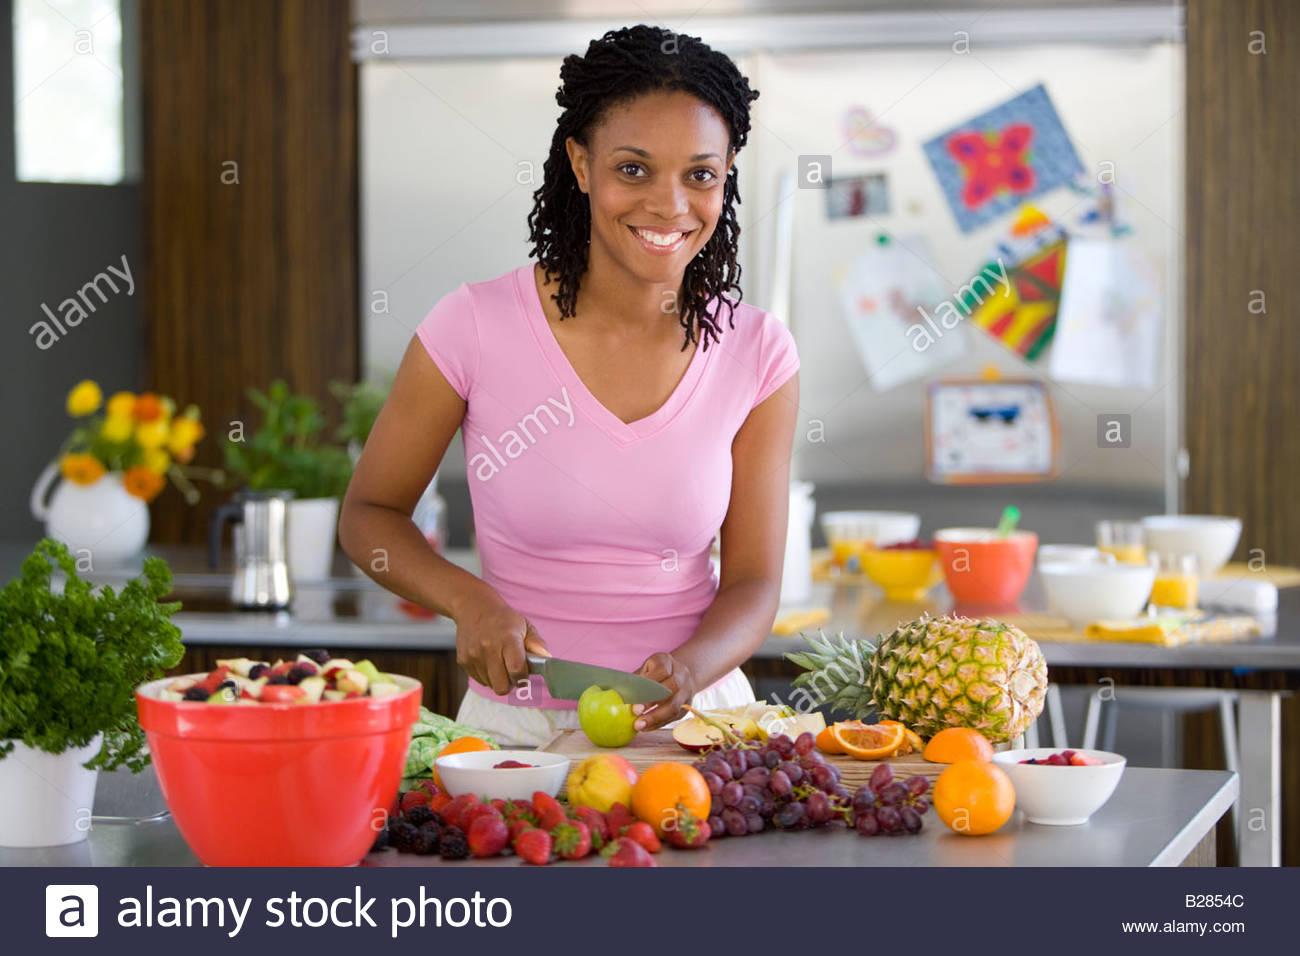 Woman making fruit salad, portrait - Stock Image